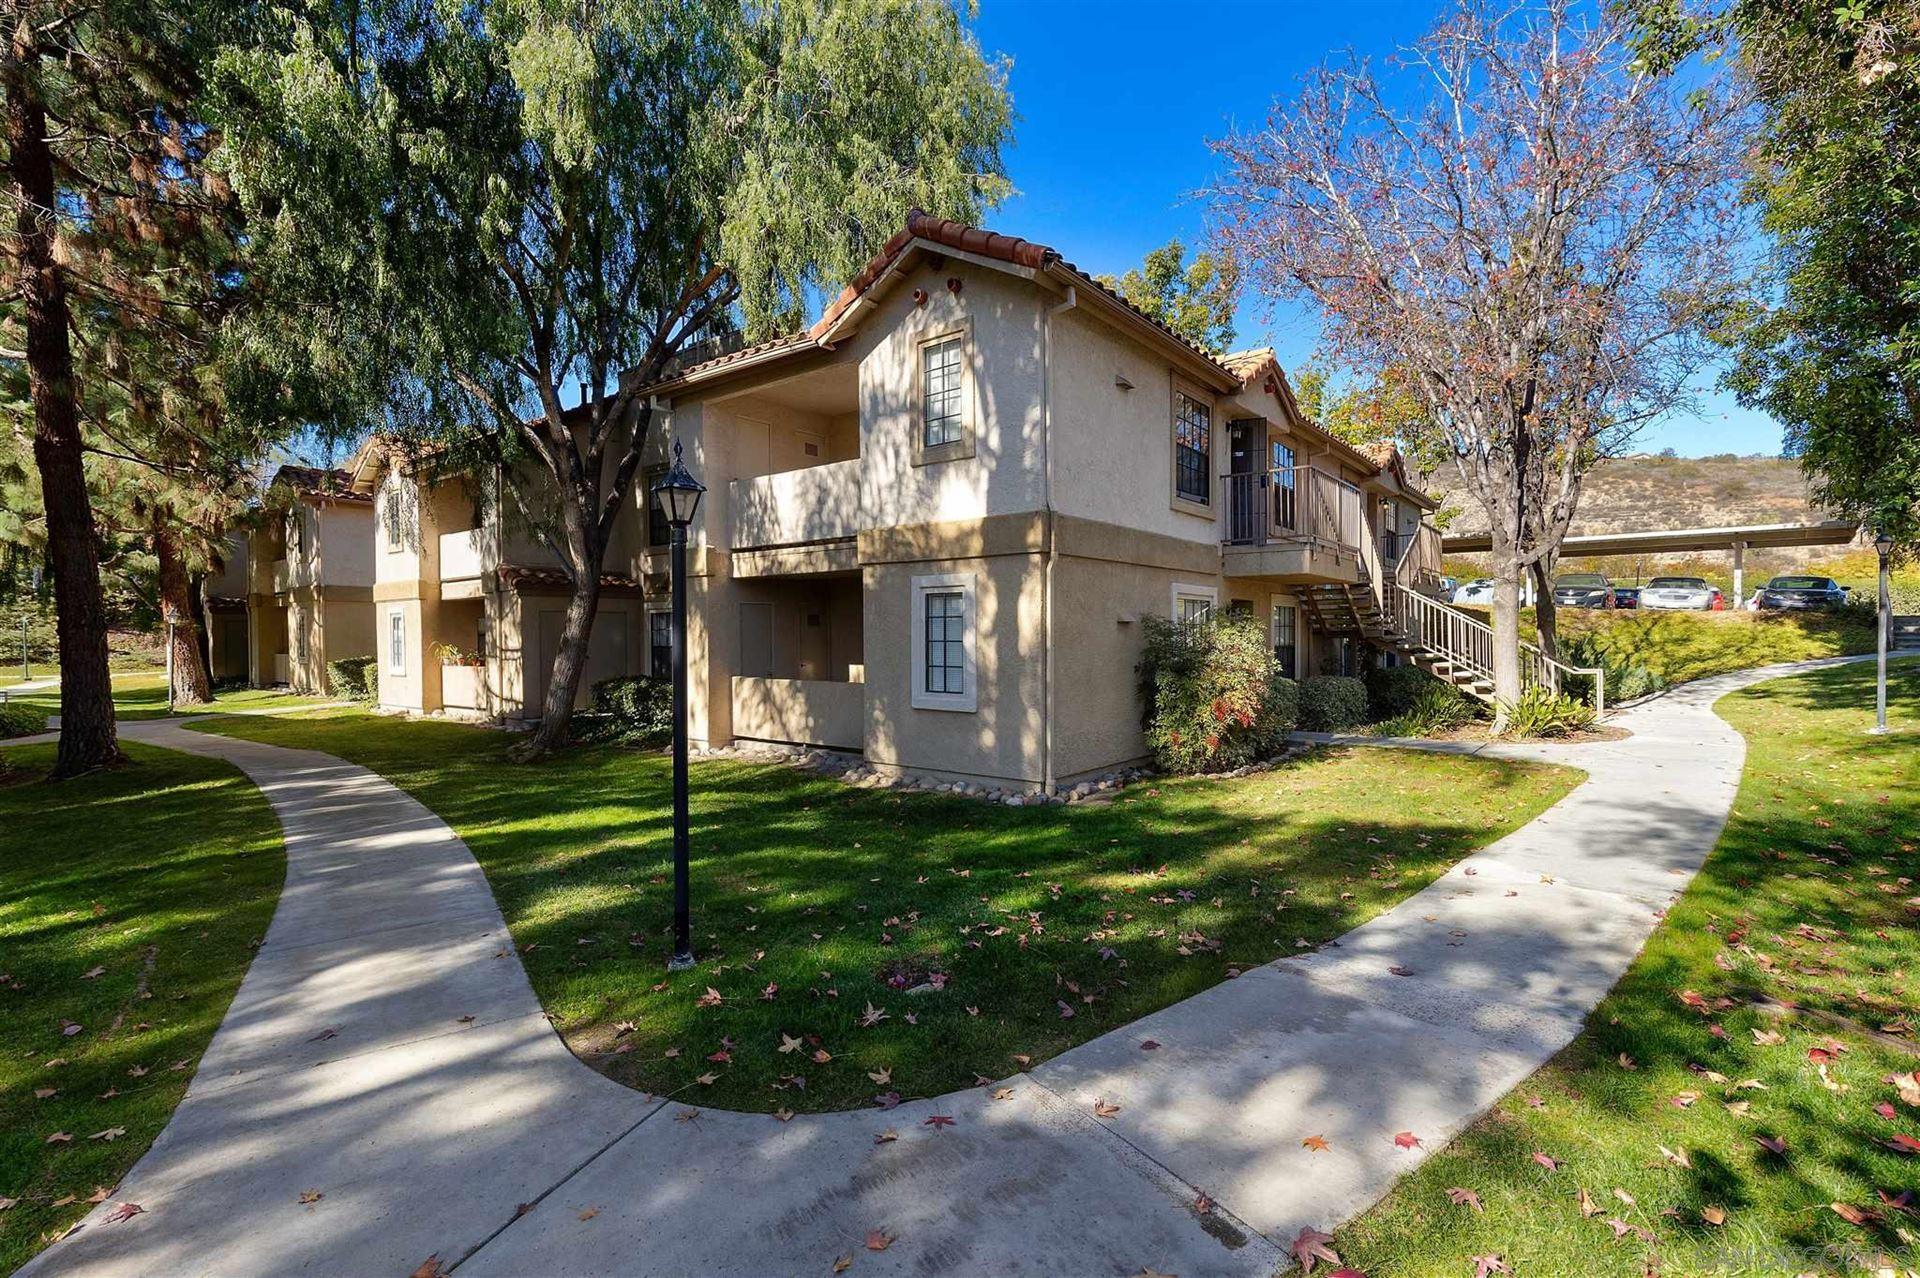 Photo of 10303 Azuaga St. #11, San Diego, CA 92129 (MLS # 210001163)